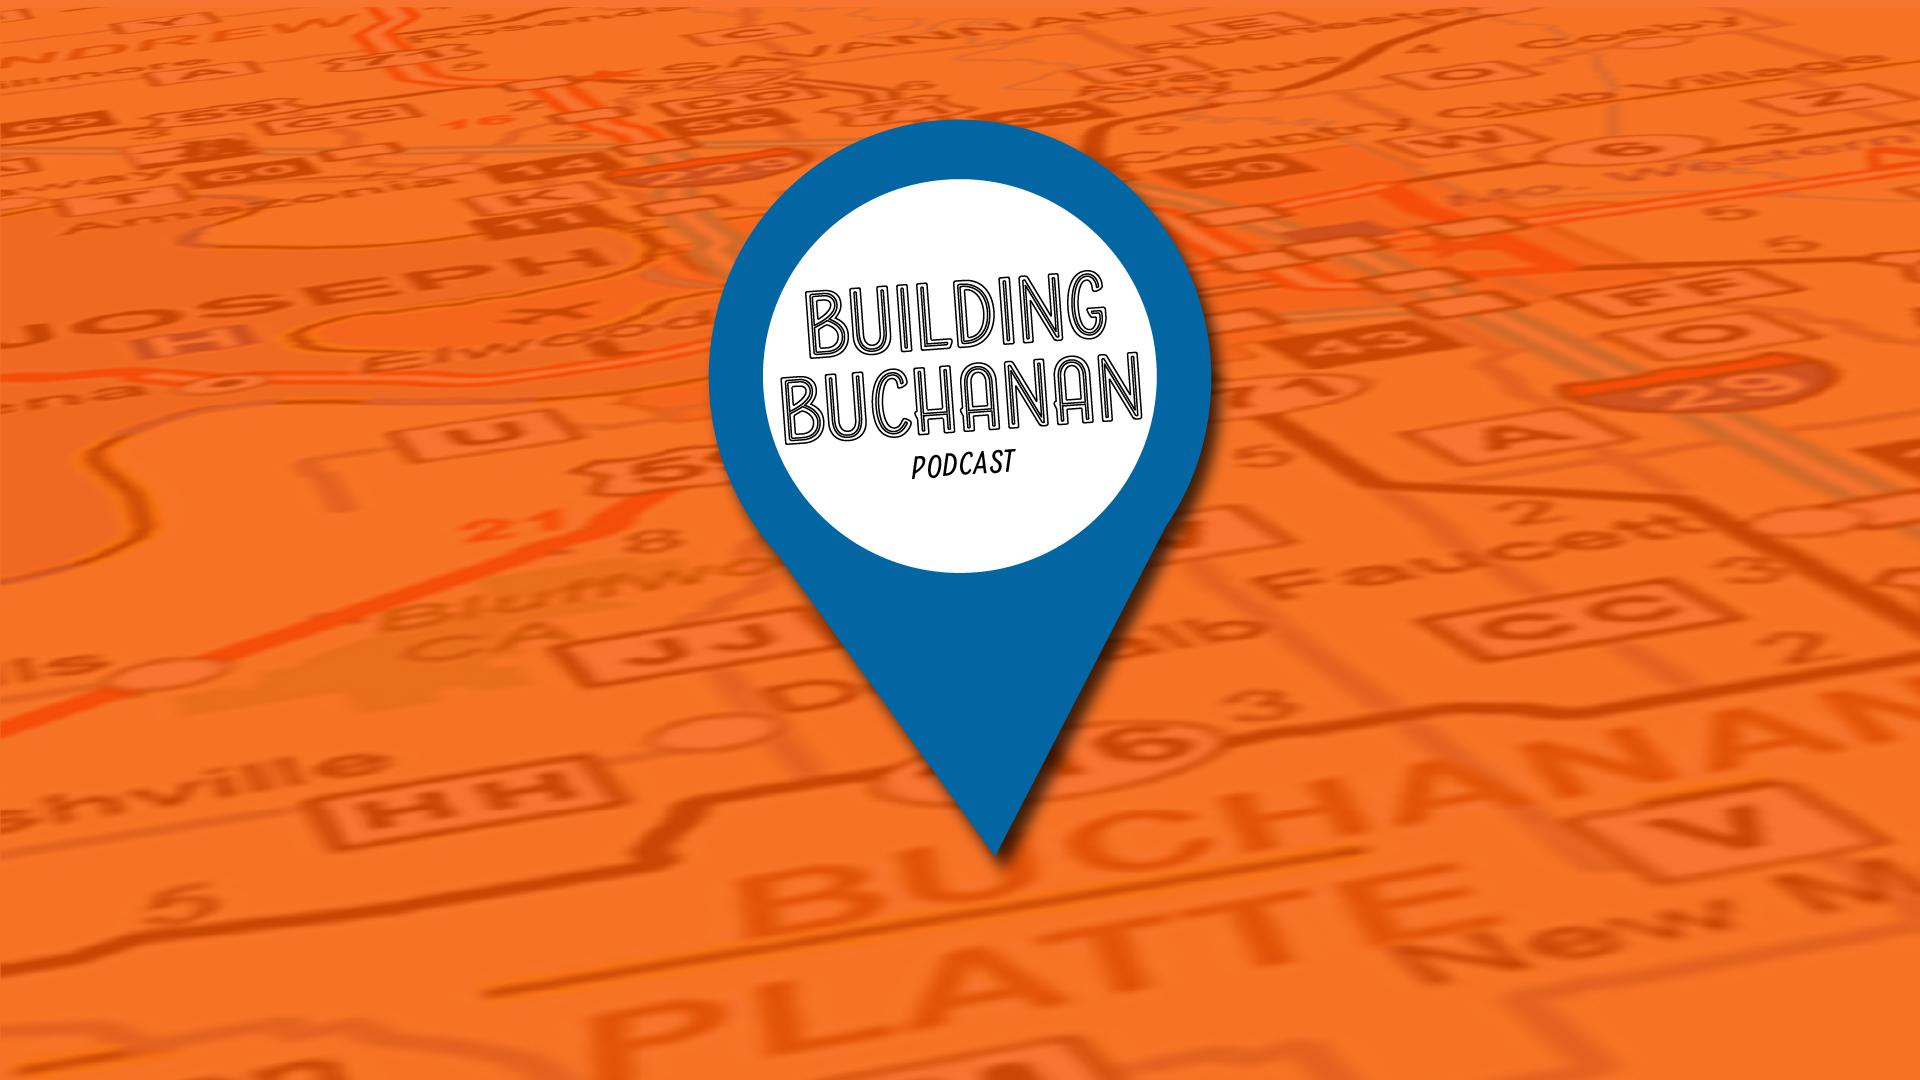 Building Buchanan podcast banner